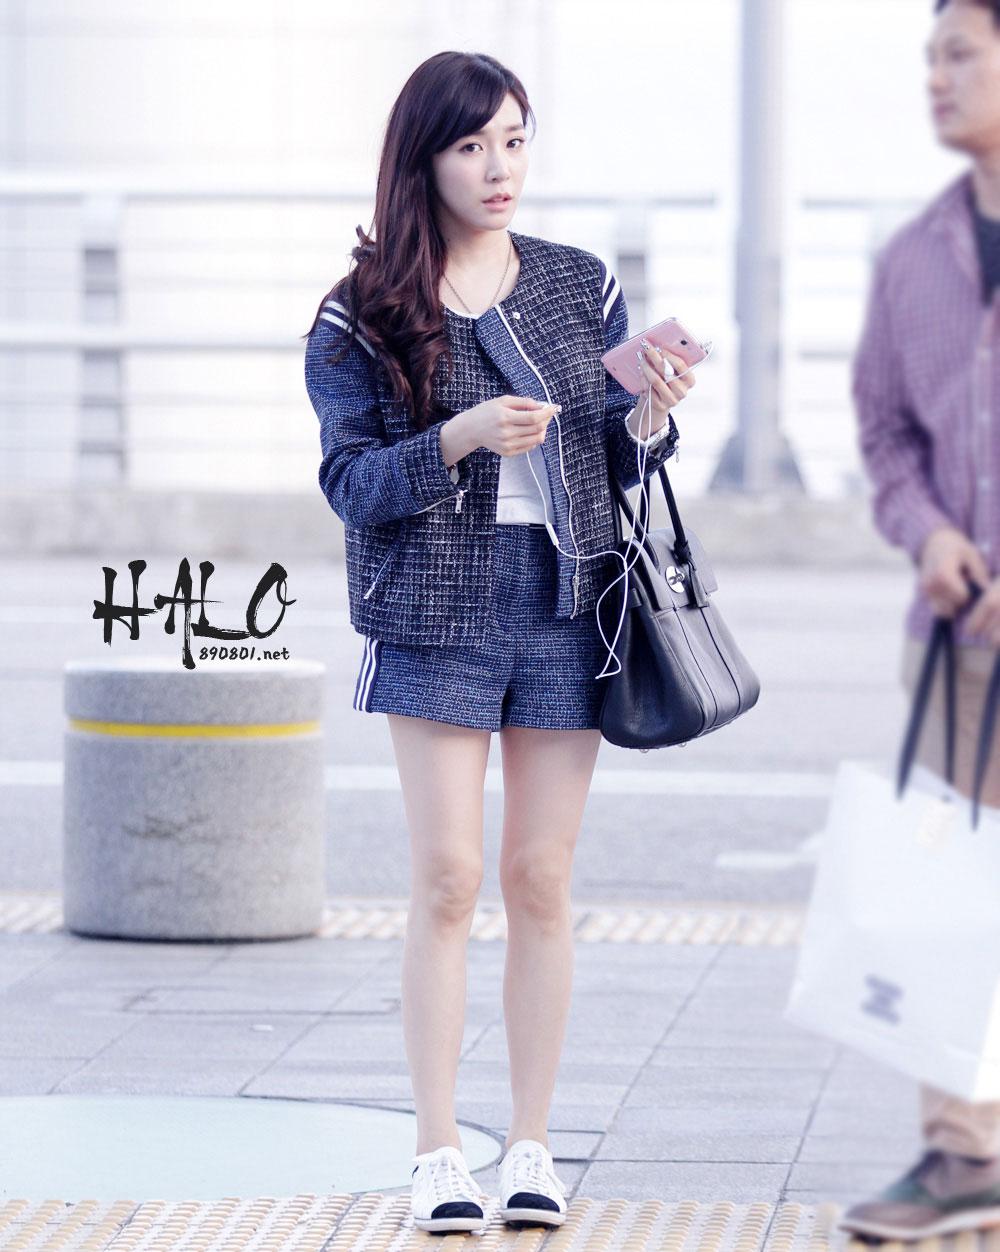 Tiffany Incheon Airport 130504 encore